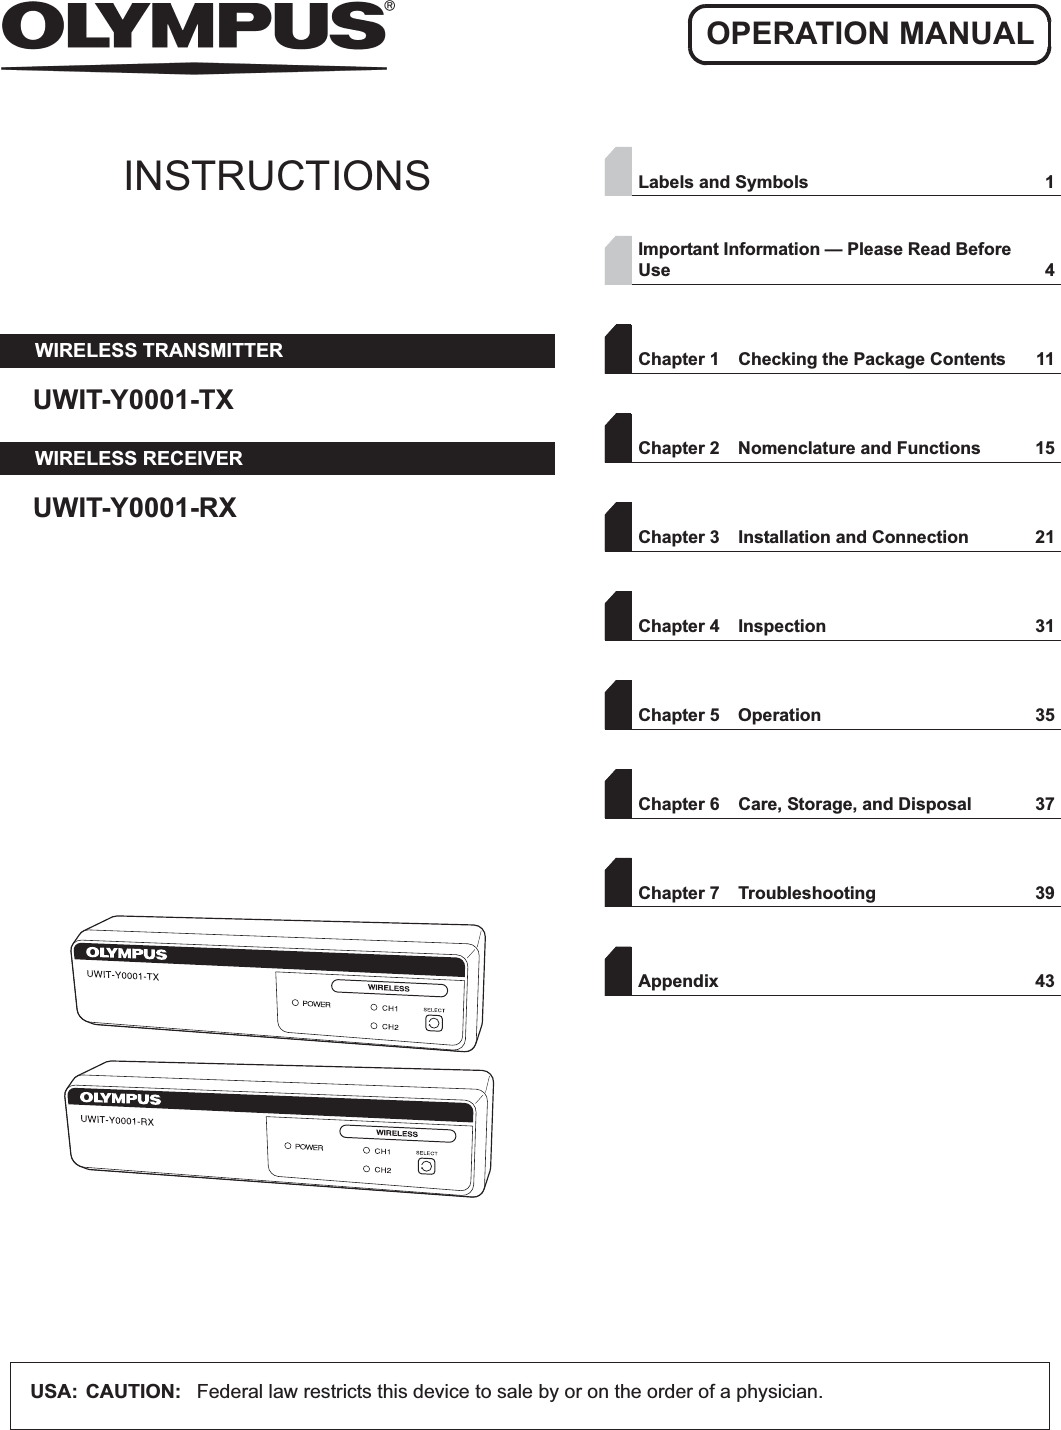 olympus c-450 zoom user manual